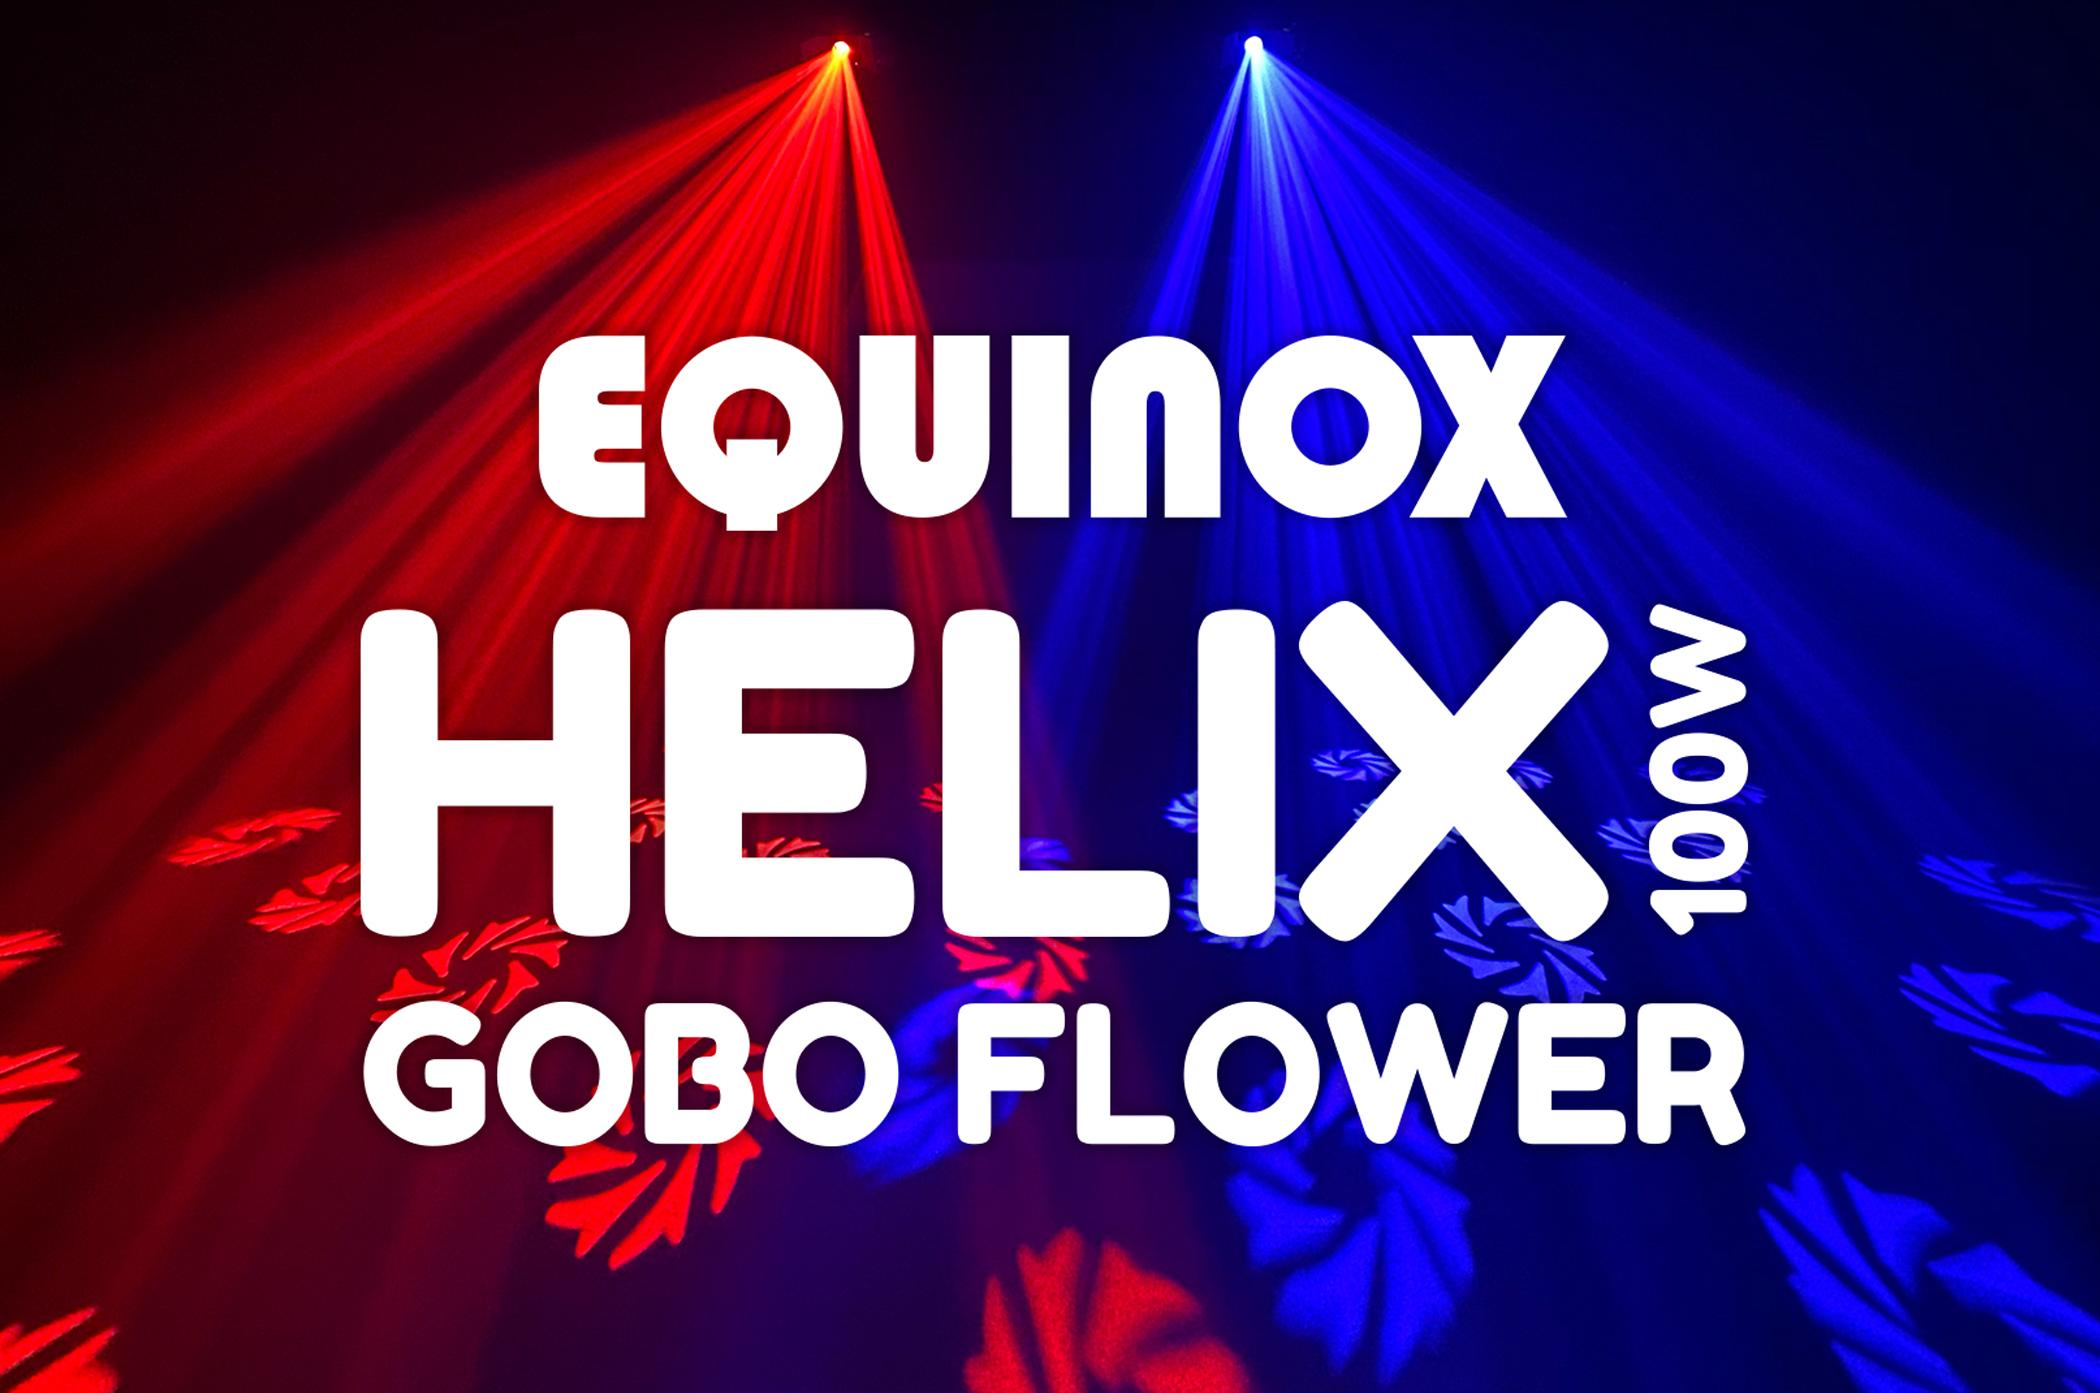 Equinox Helix Gobo Flower